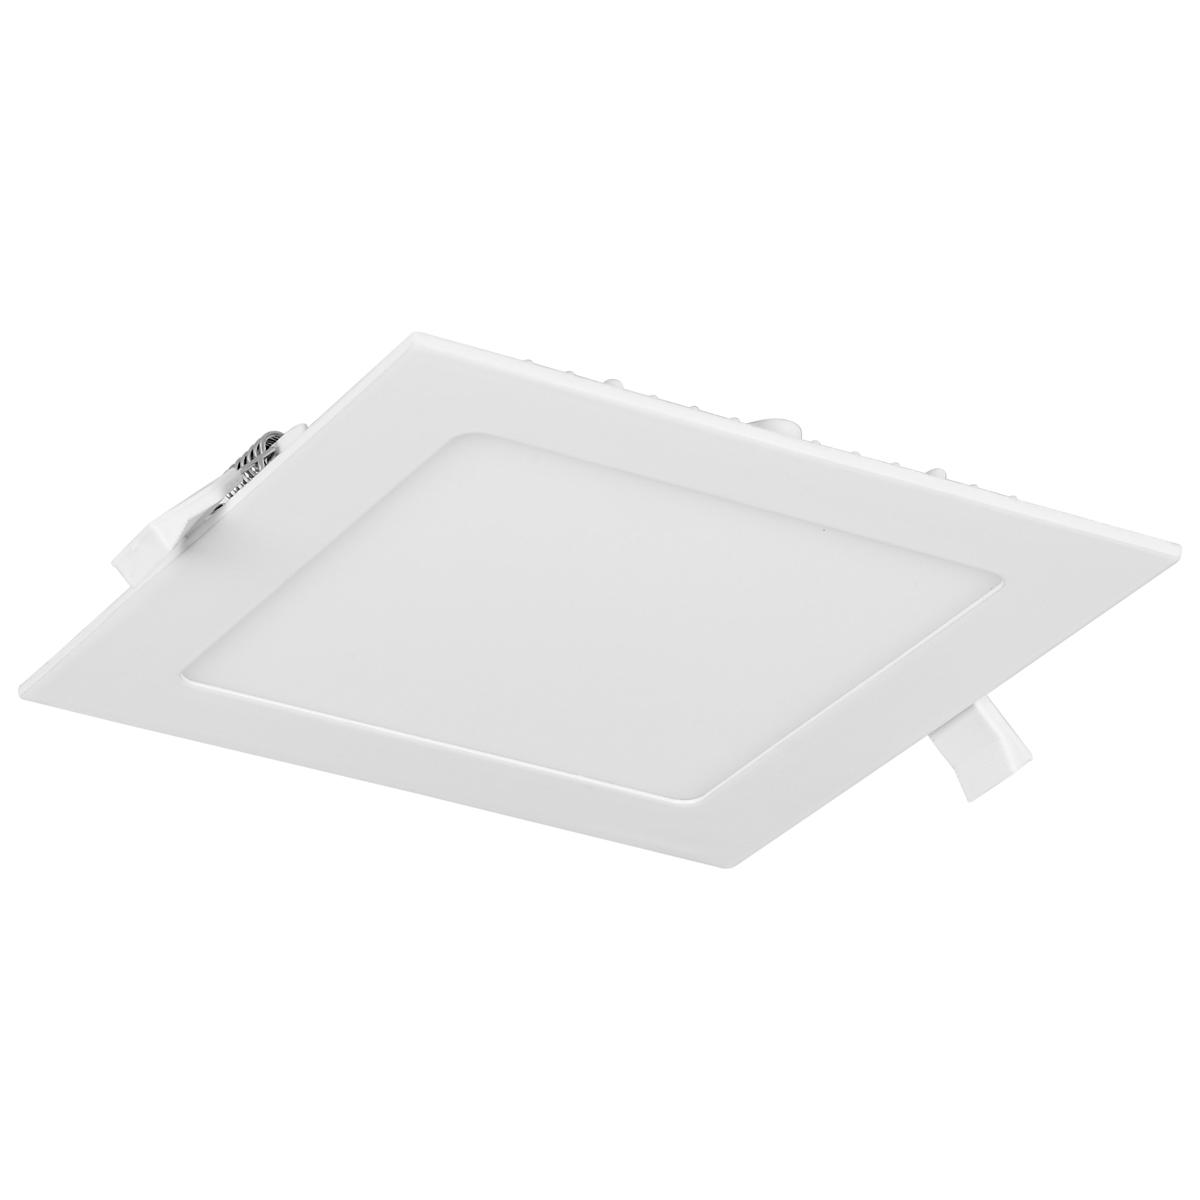 Havells 24w led 3000k octane led panel square light fitting lhebhep5iz1w024